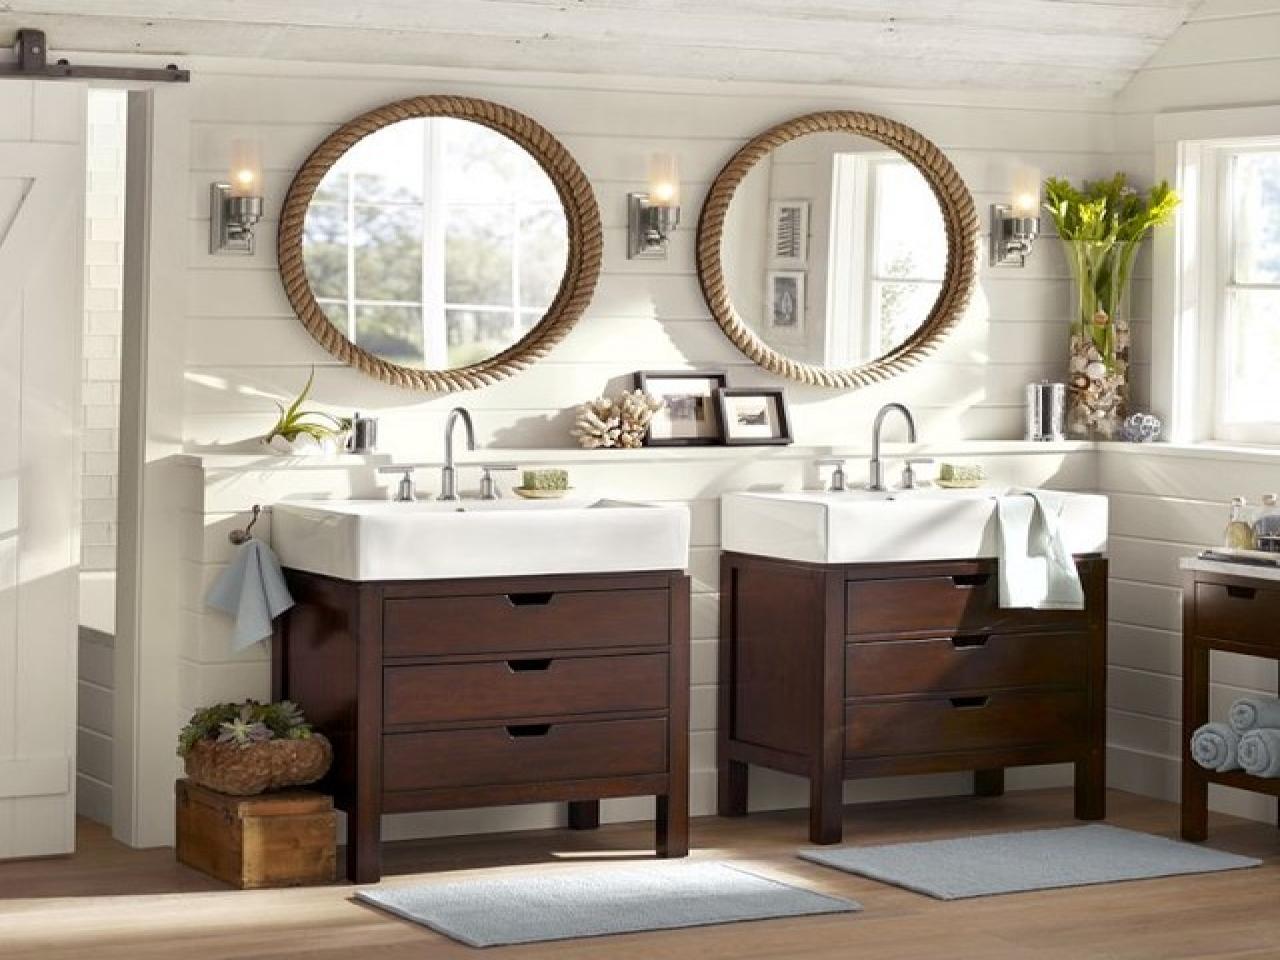 Elegant%2BVanity%2BMirrors%2Bwith%2BSink%2BDesign%2Bfor%2Bbathroom%2Bprepare%2B%252815%2529 25 Elegant Vanity Mirrors with Sink Design for Bathroom Prepare Interior